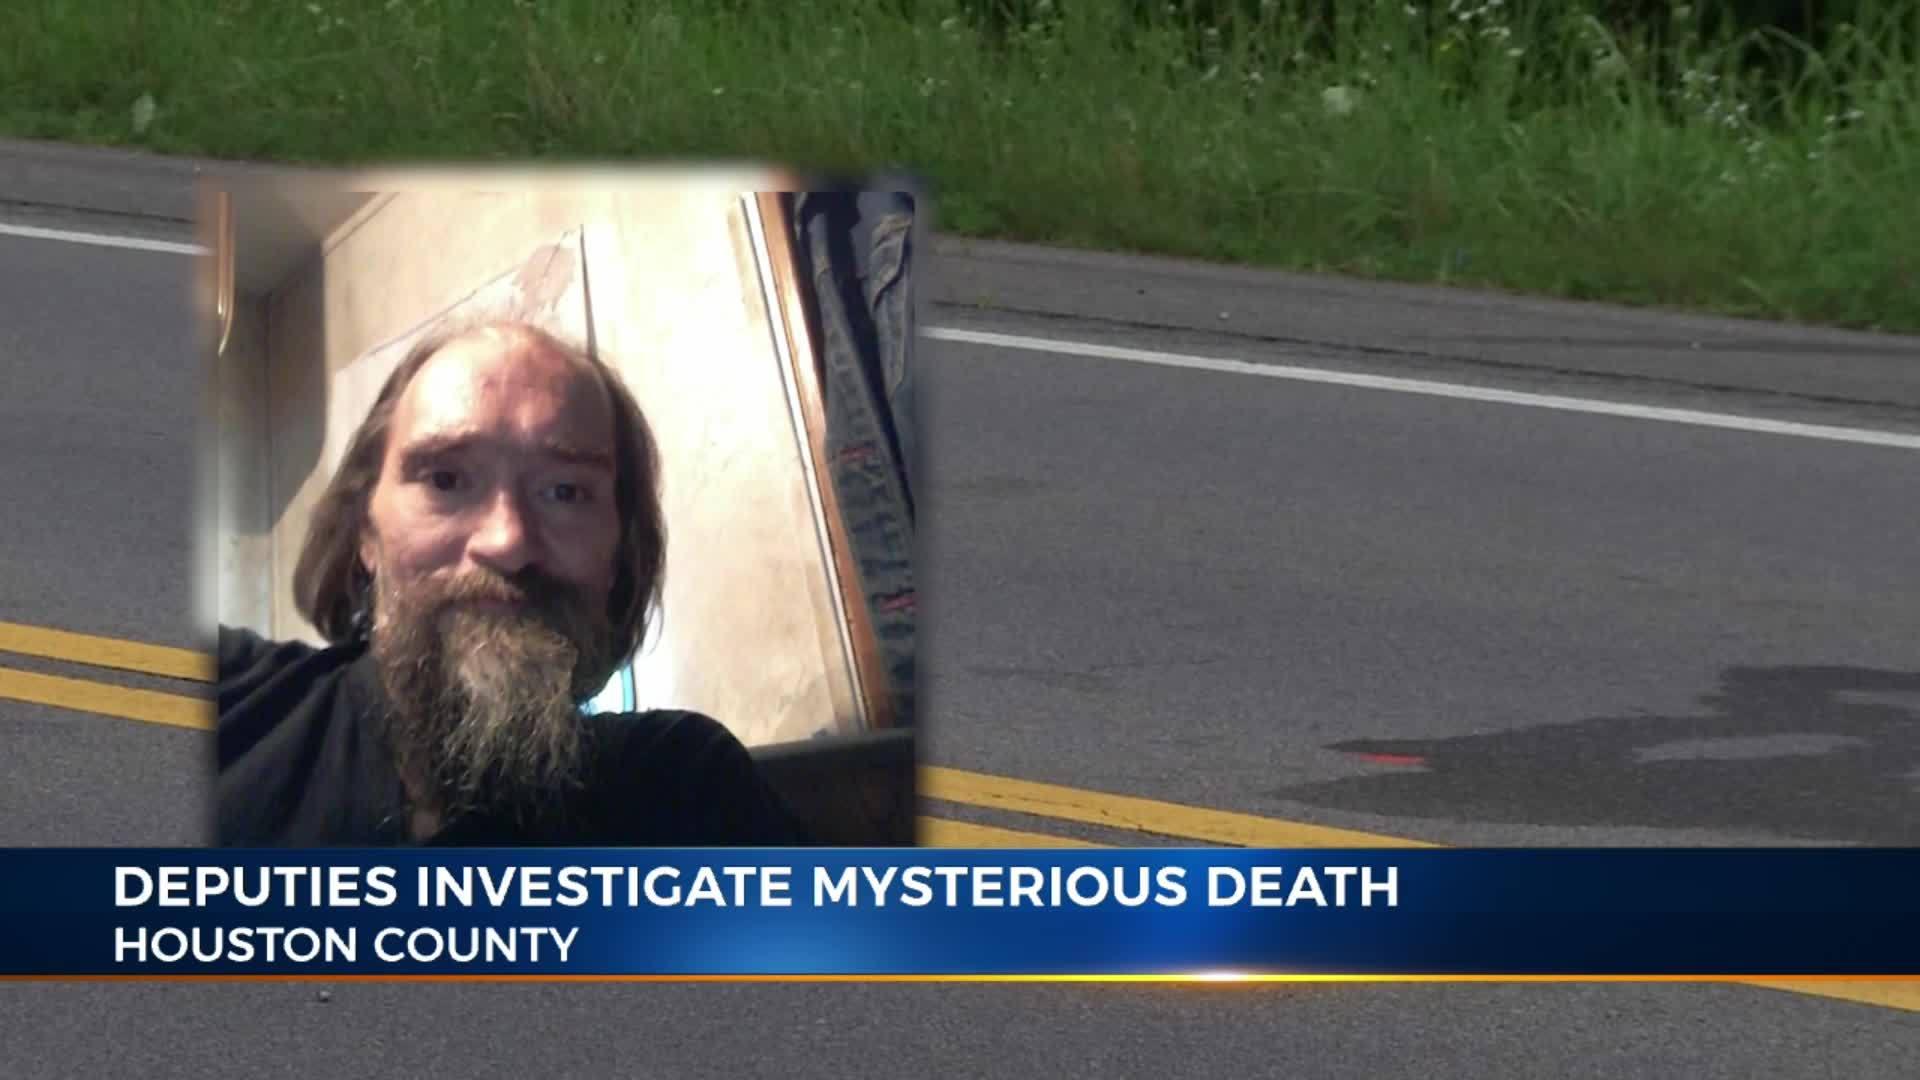 Houston_County_Death_Investigation_8_20190620042026